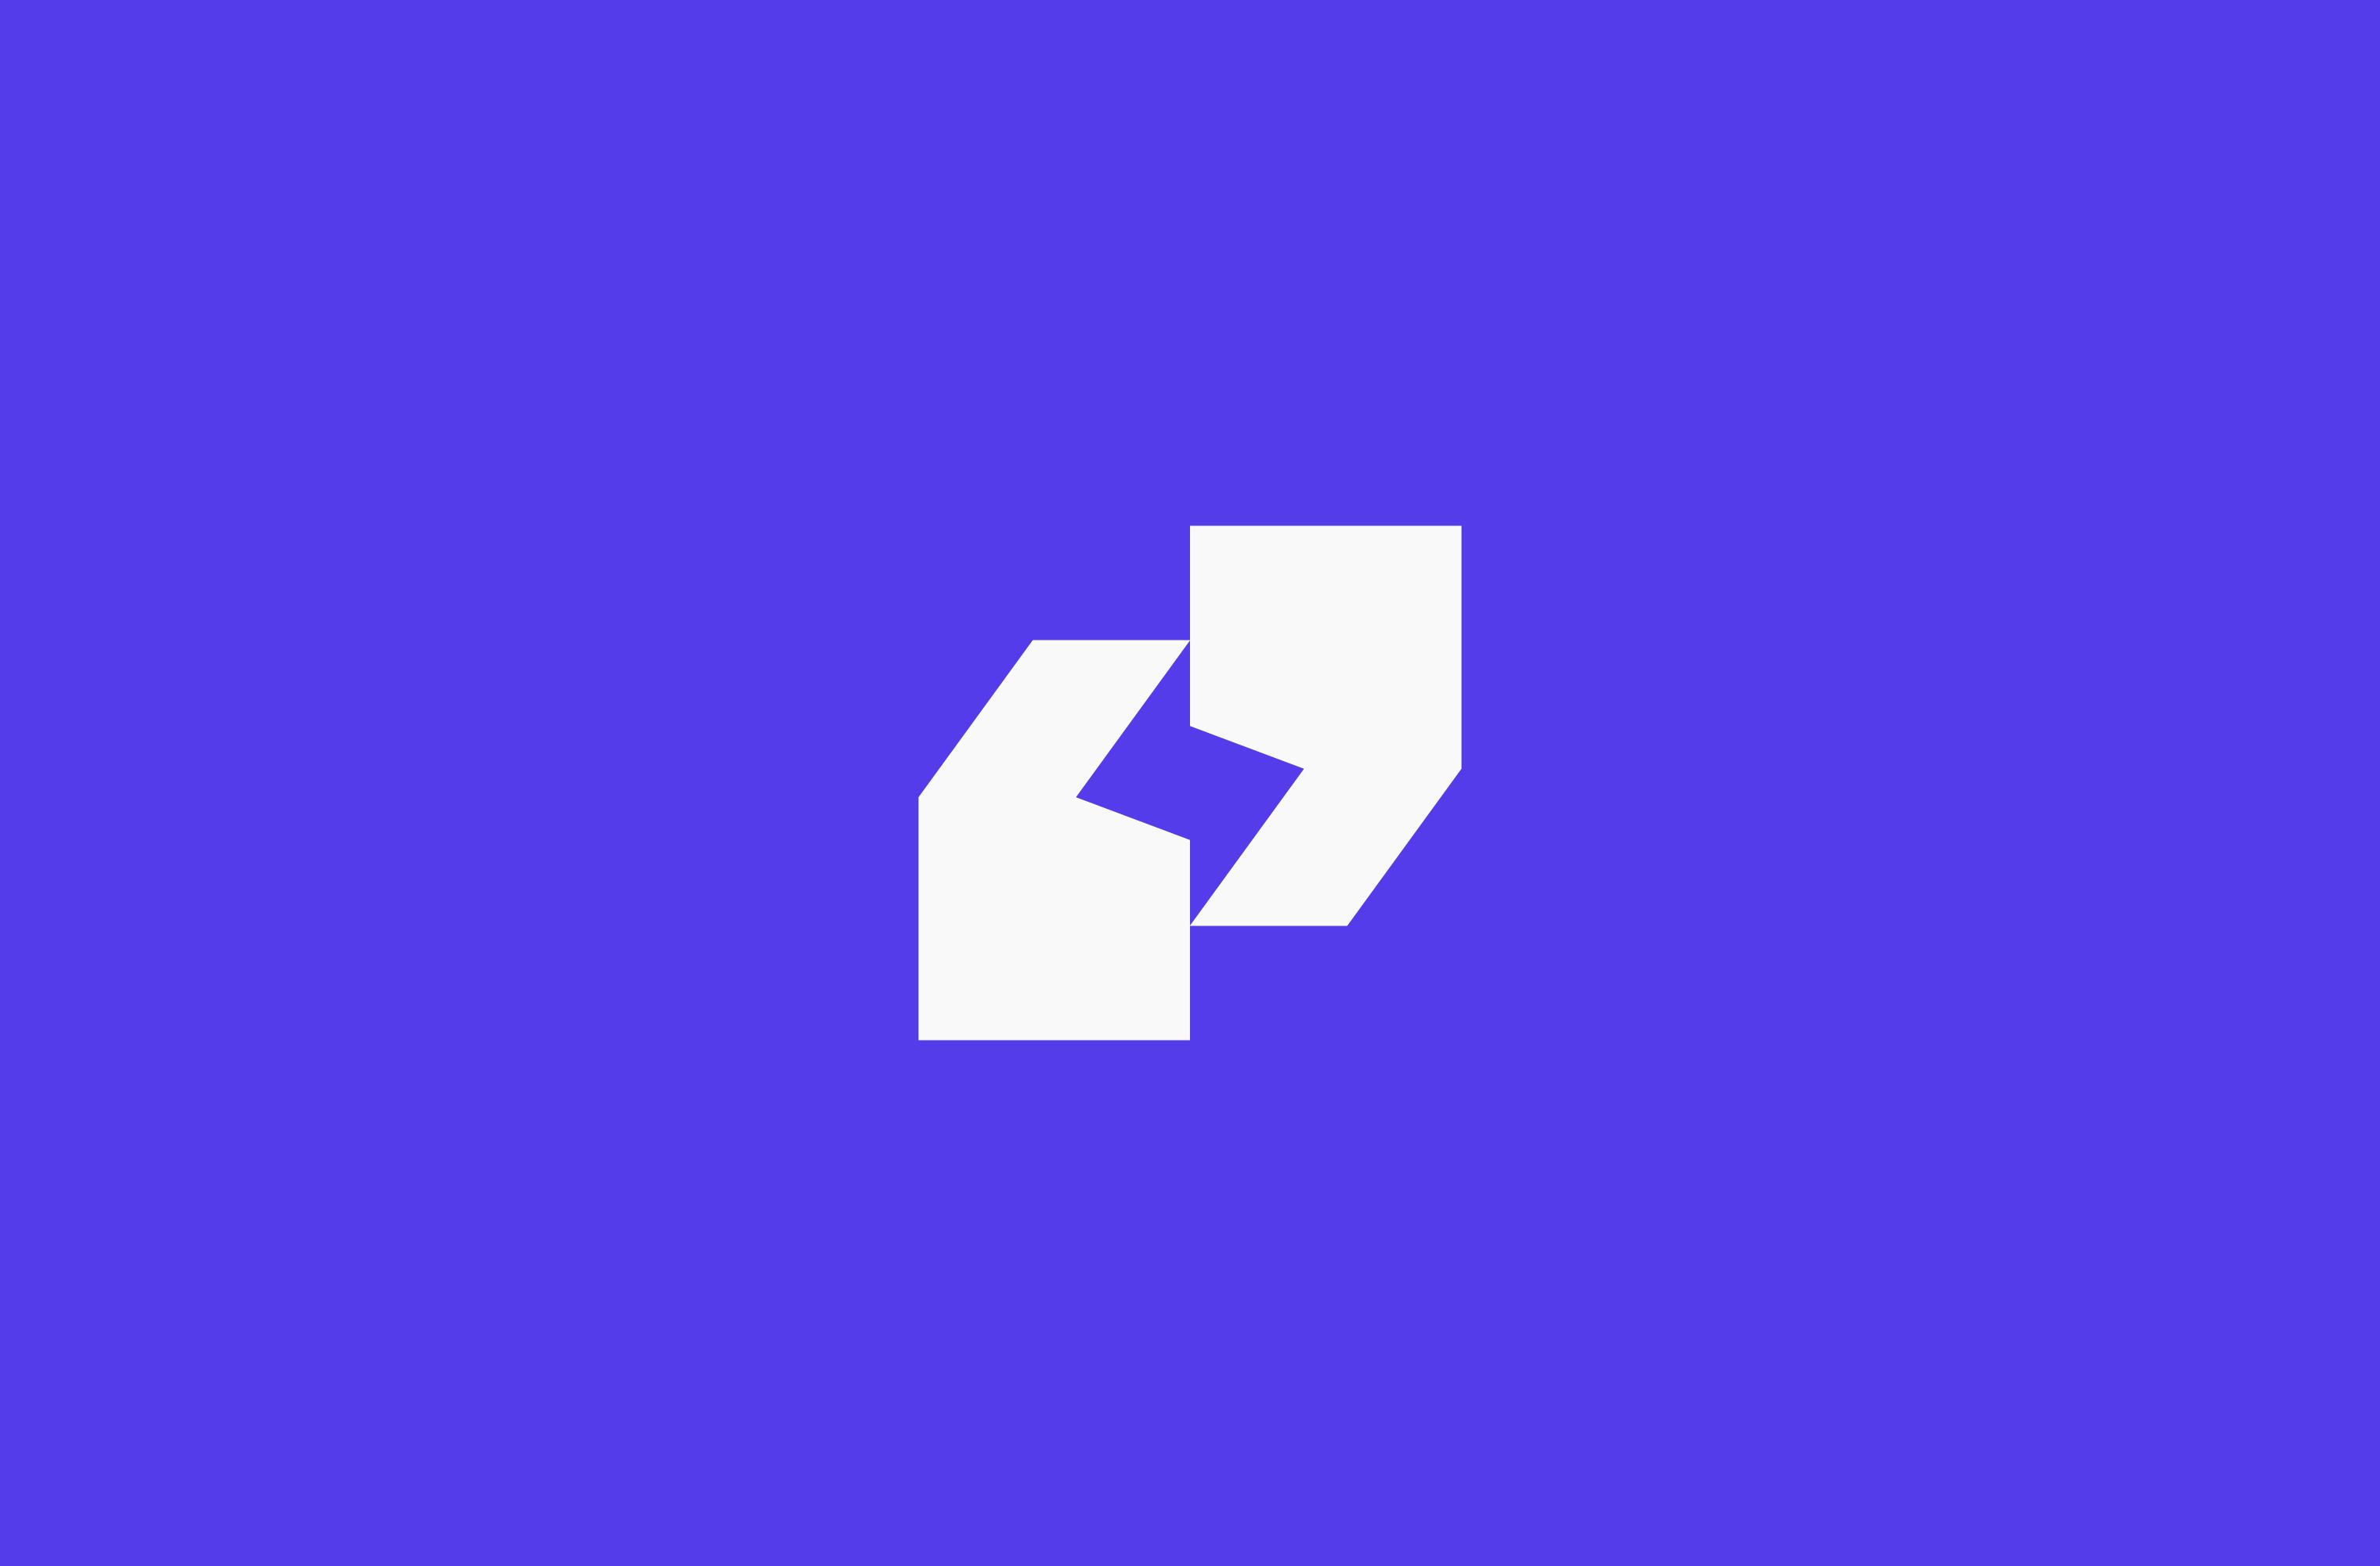 White Lightning Talks symbol on a purple background